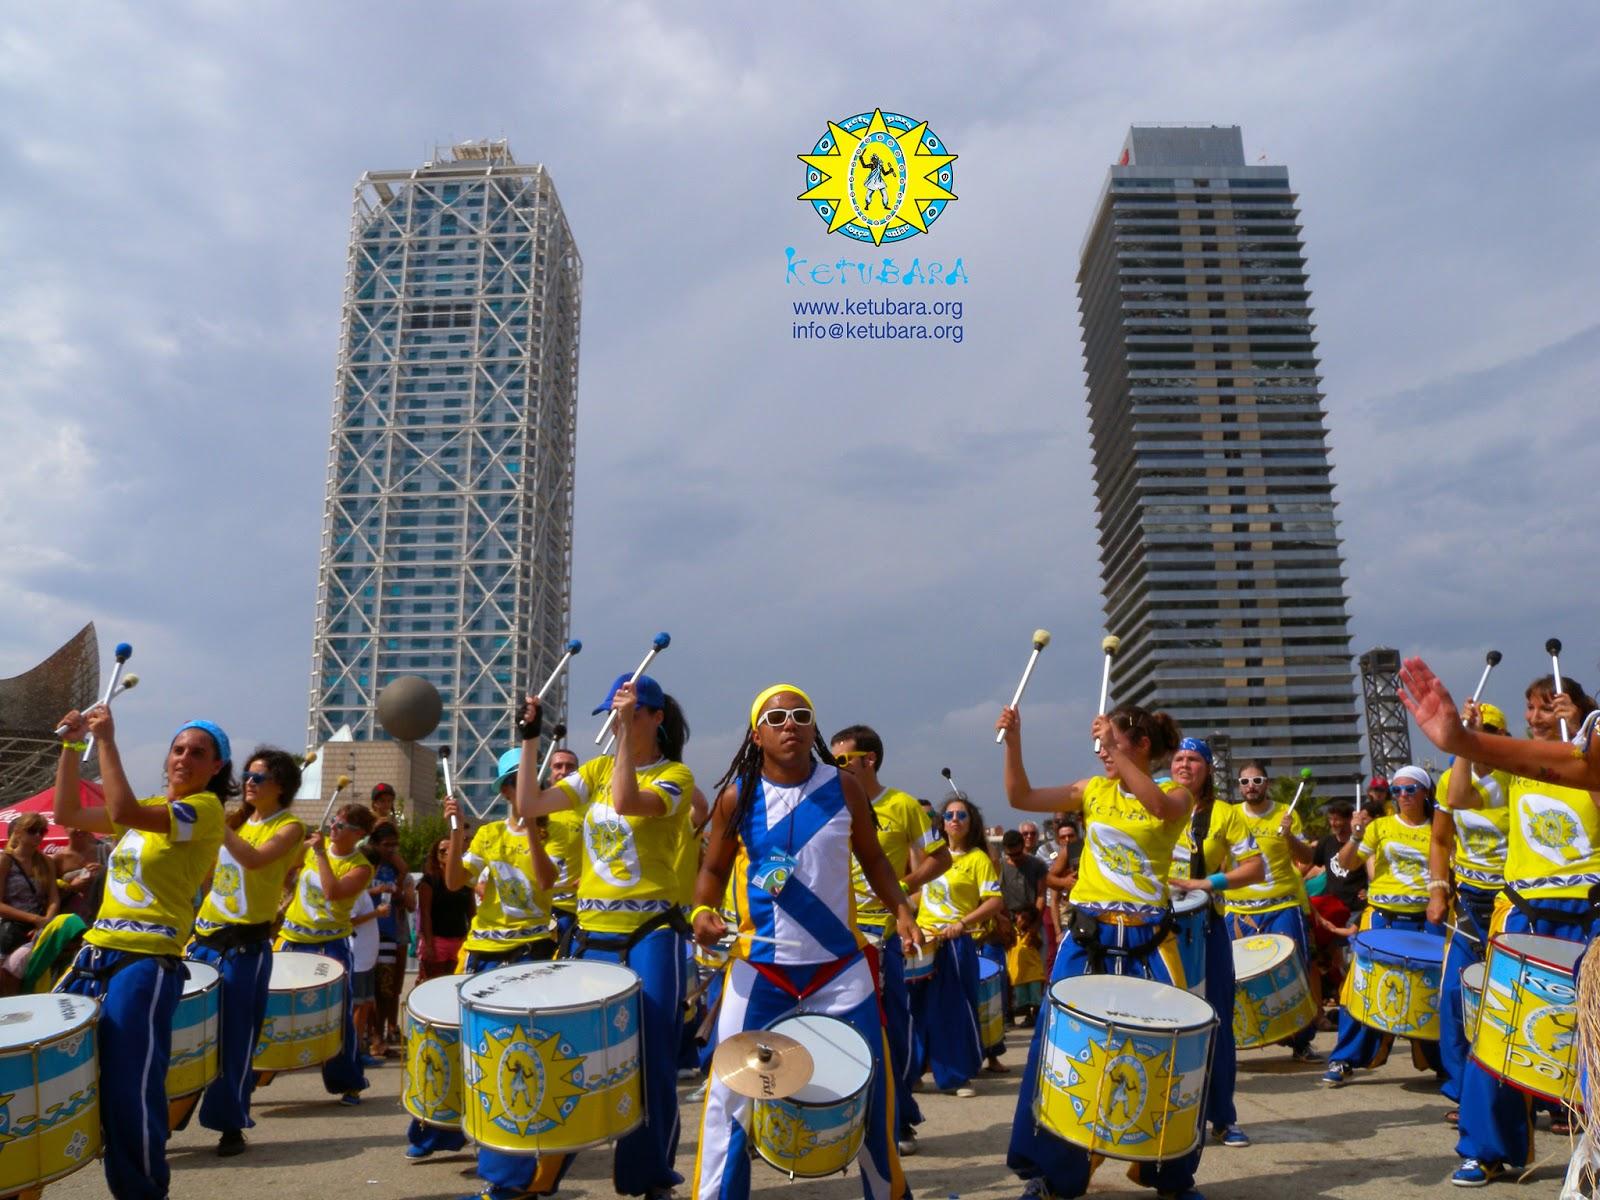 dia de brasil ketubara cultura brasileña barcelona batucada